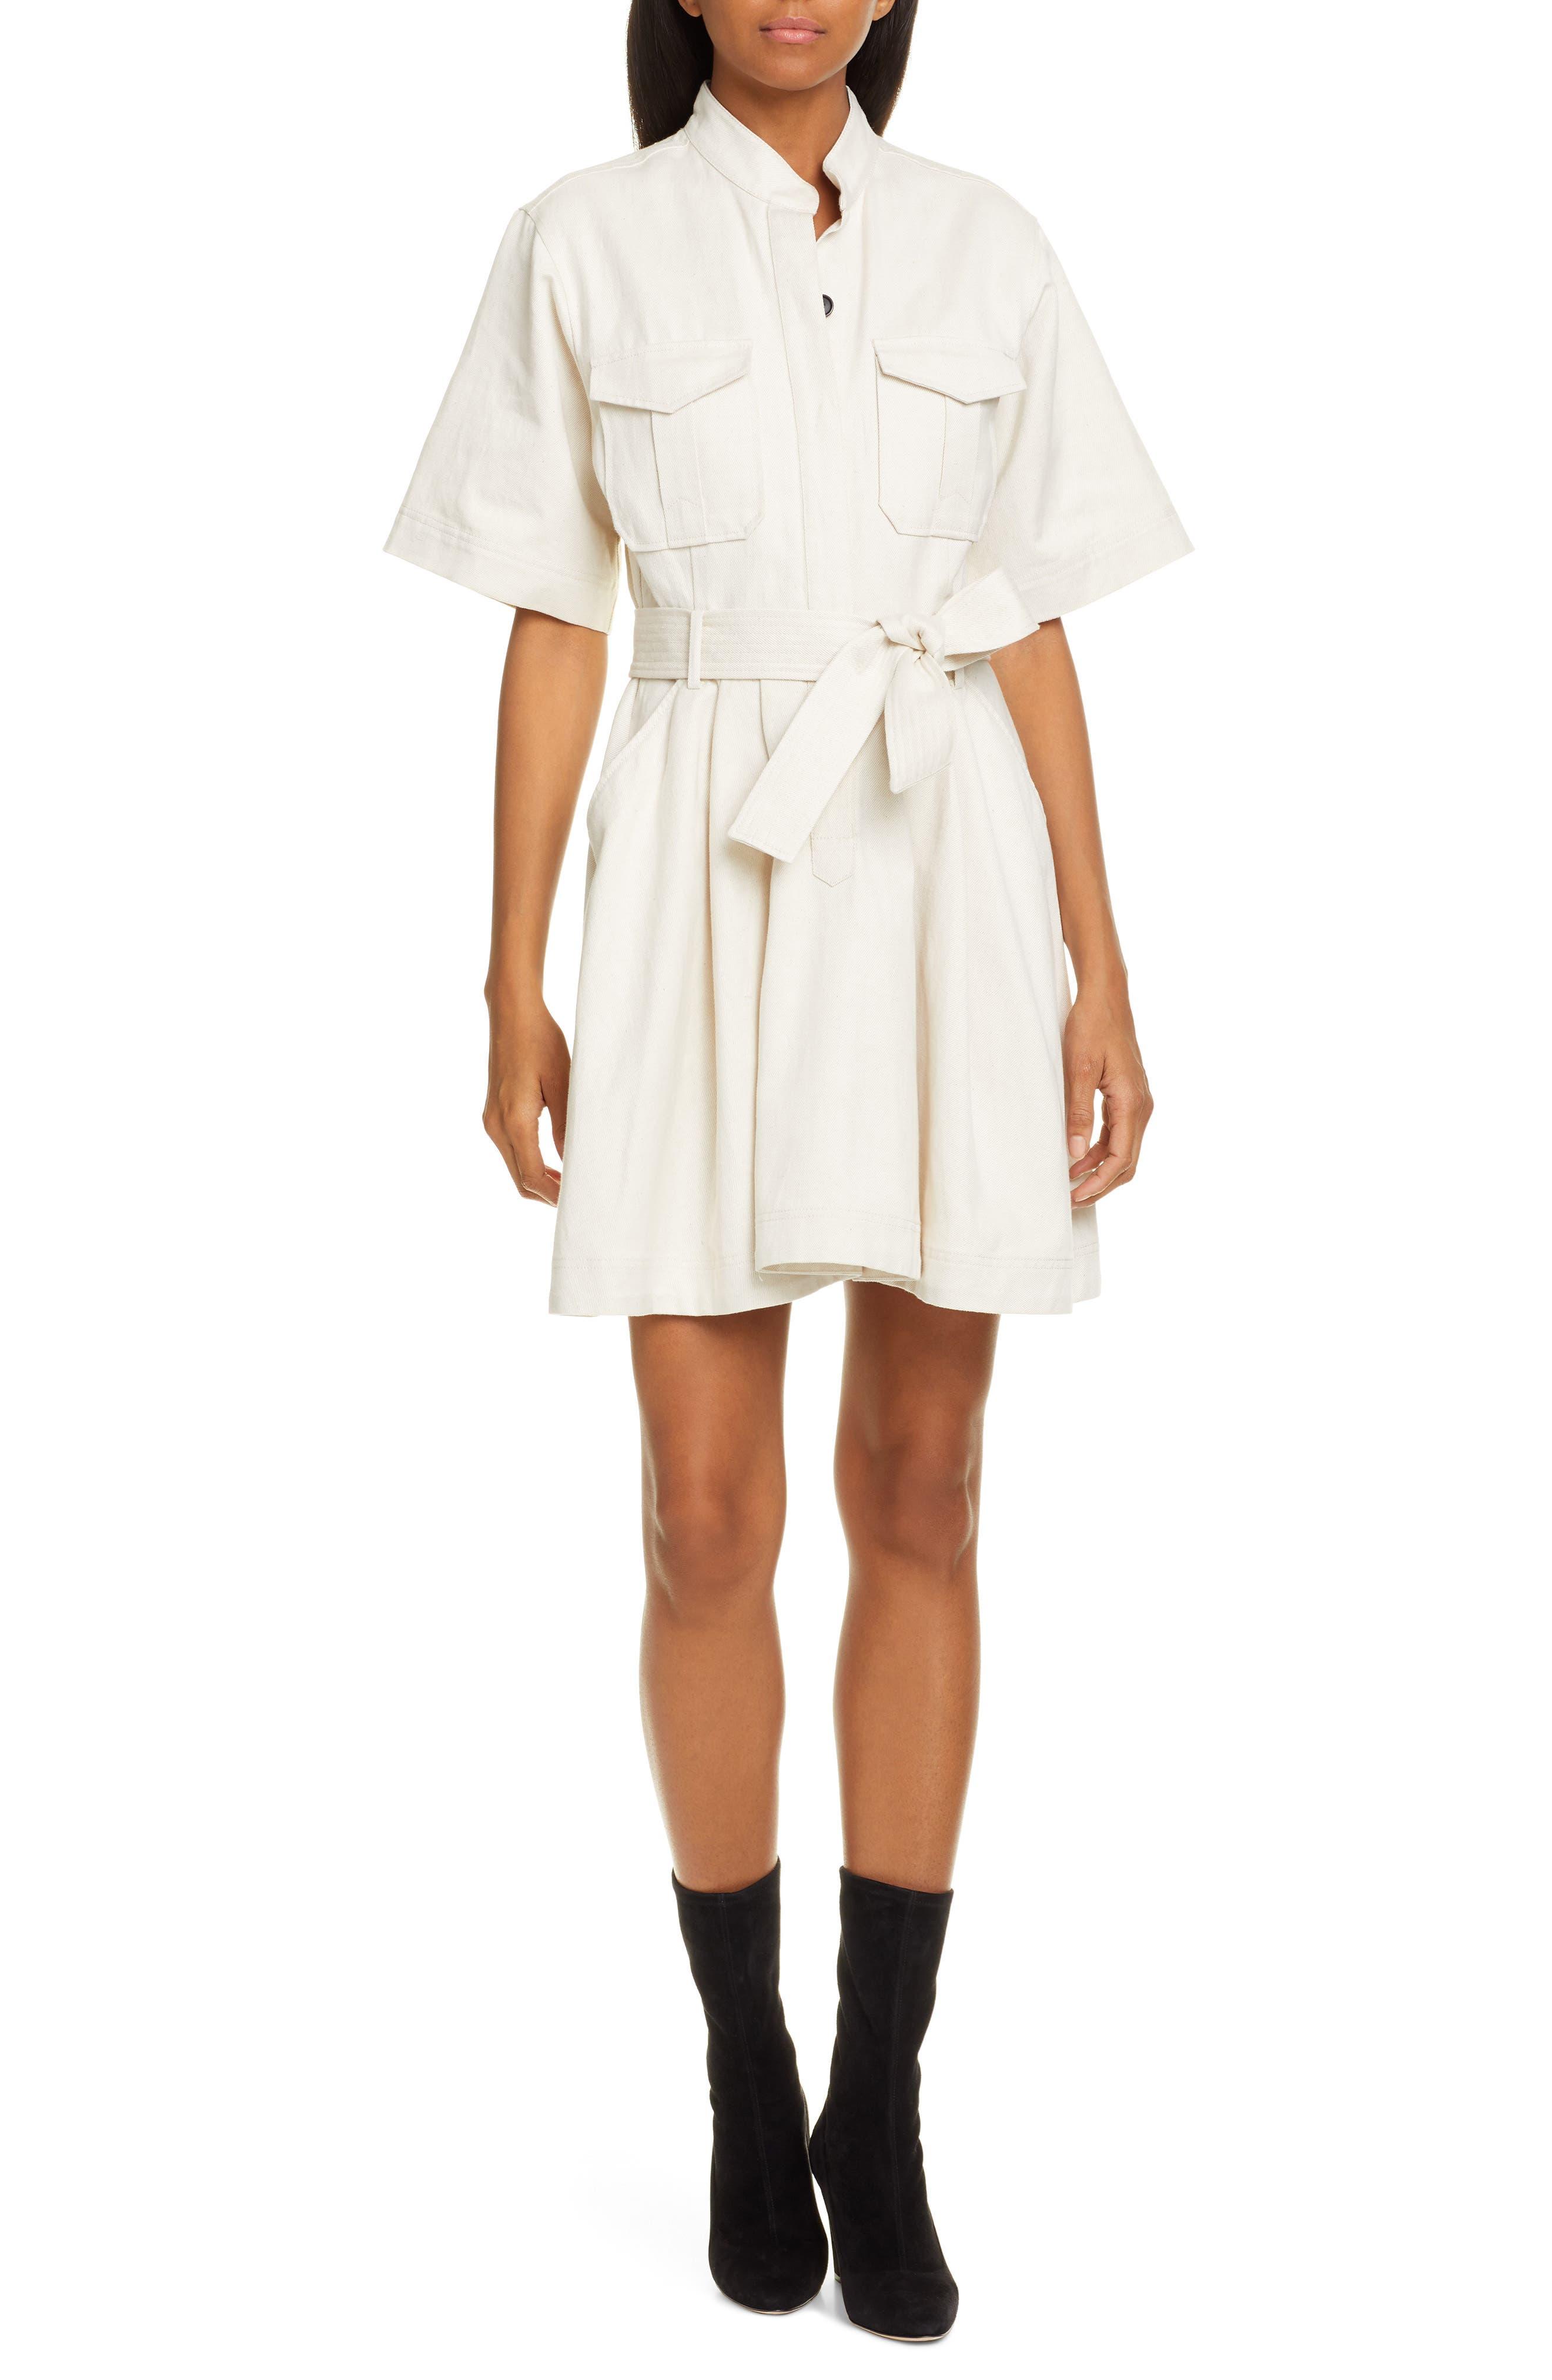 A.l.c. Bryn Belted A-Line Dress, Ivory